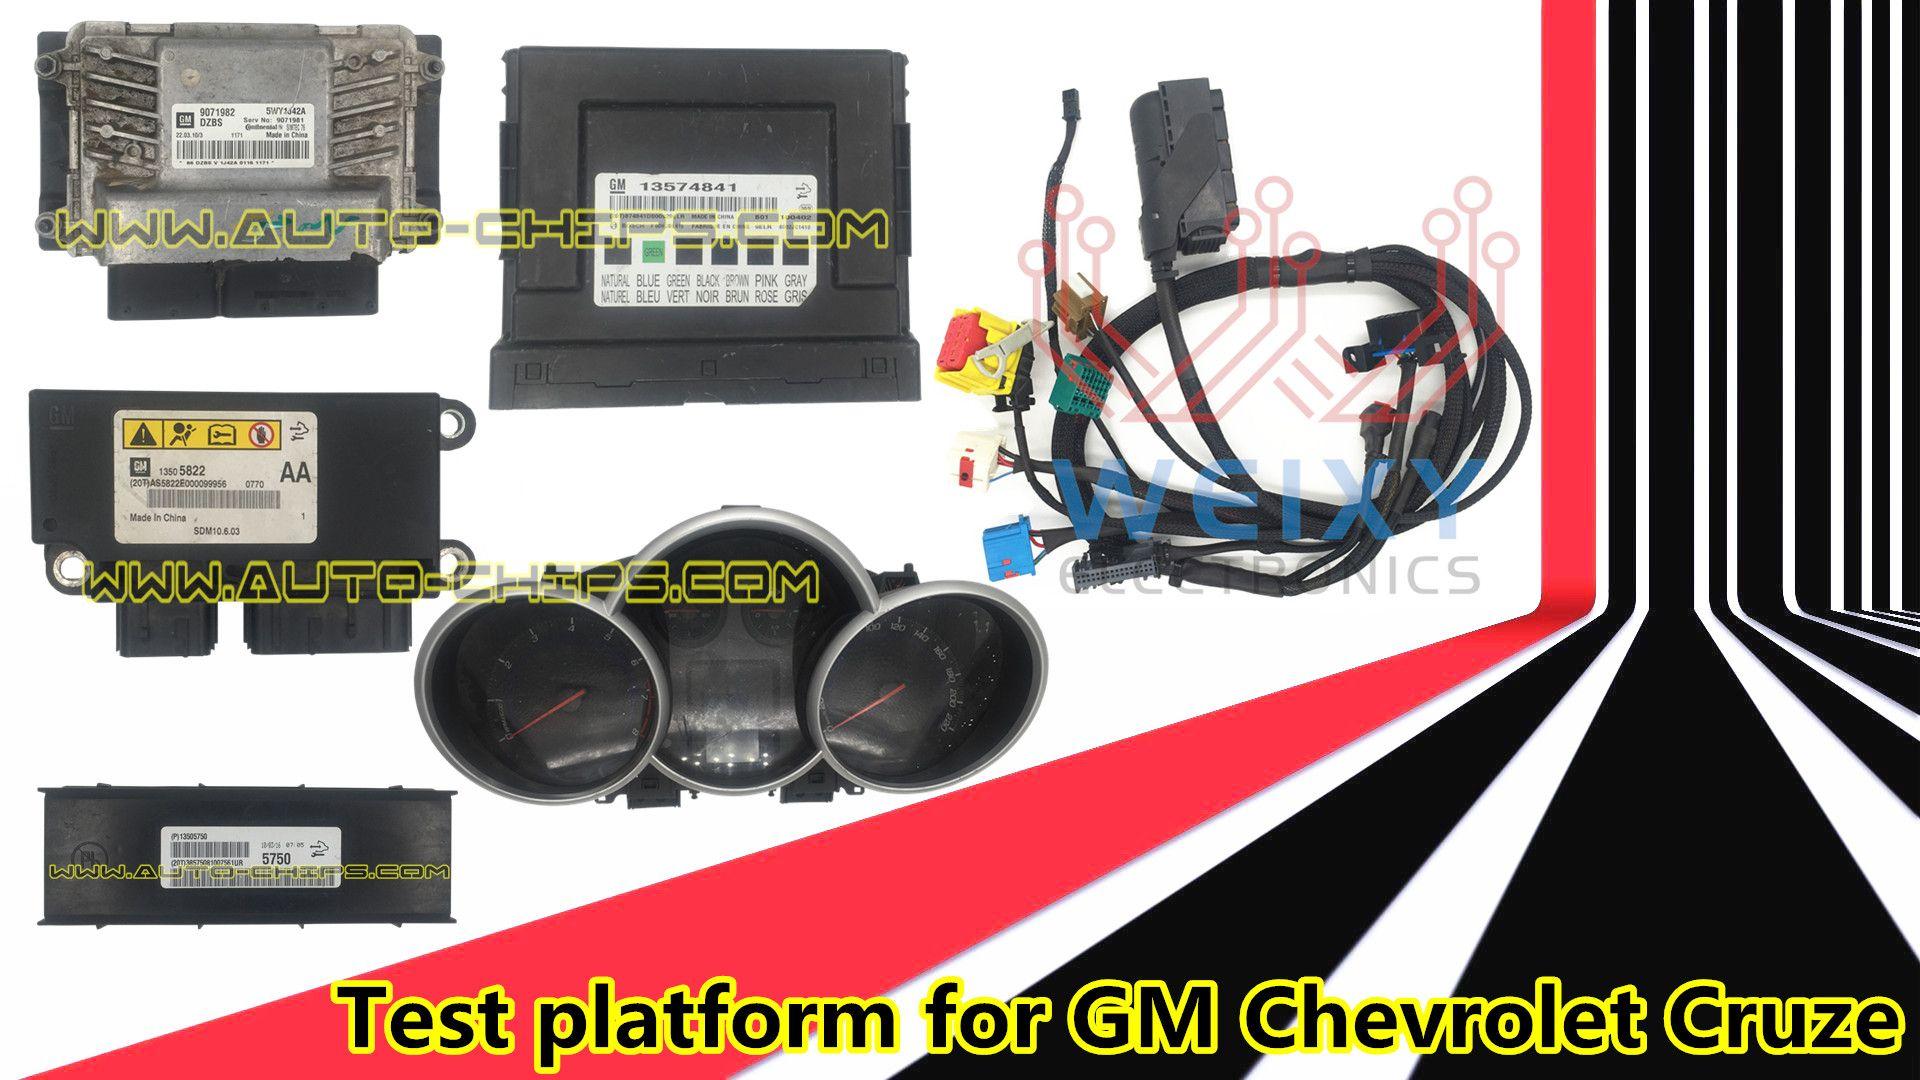 medium resolution of gm chevrolet cruze test platform enable programing keys on the bench restore airbag ecm